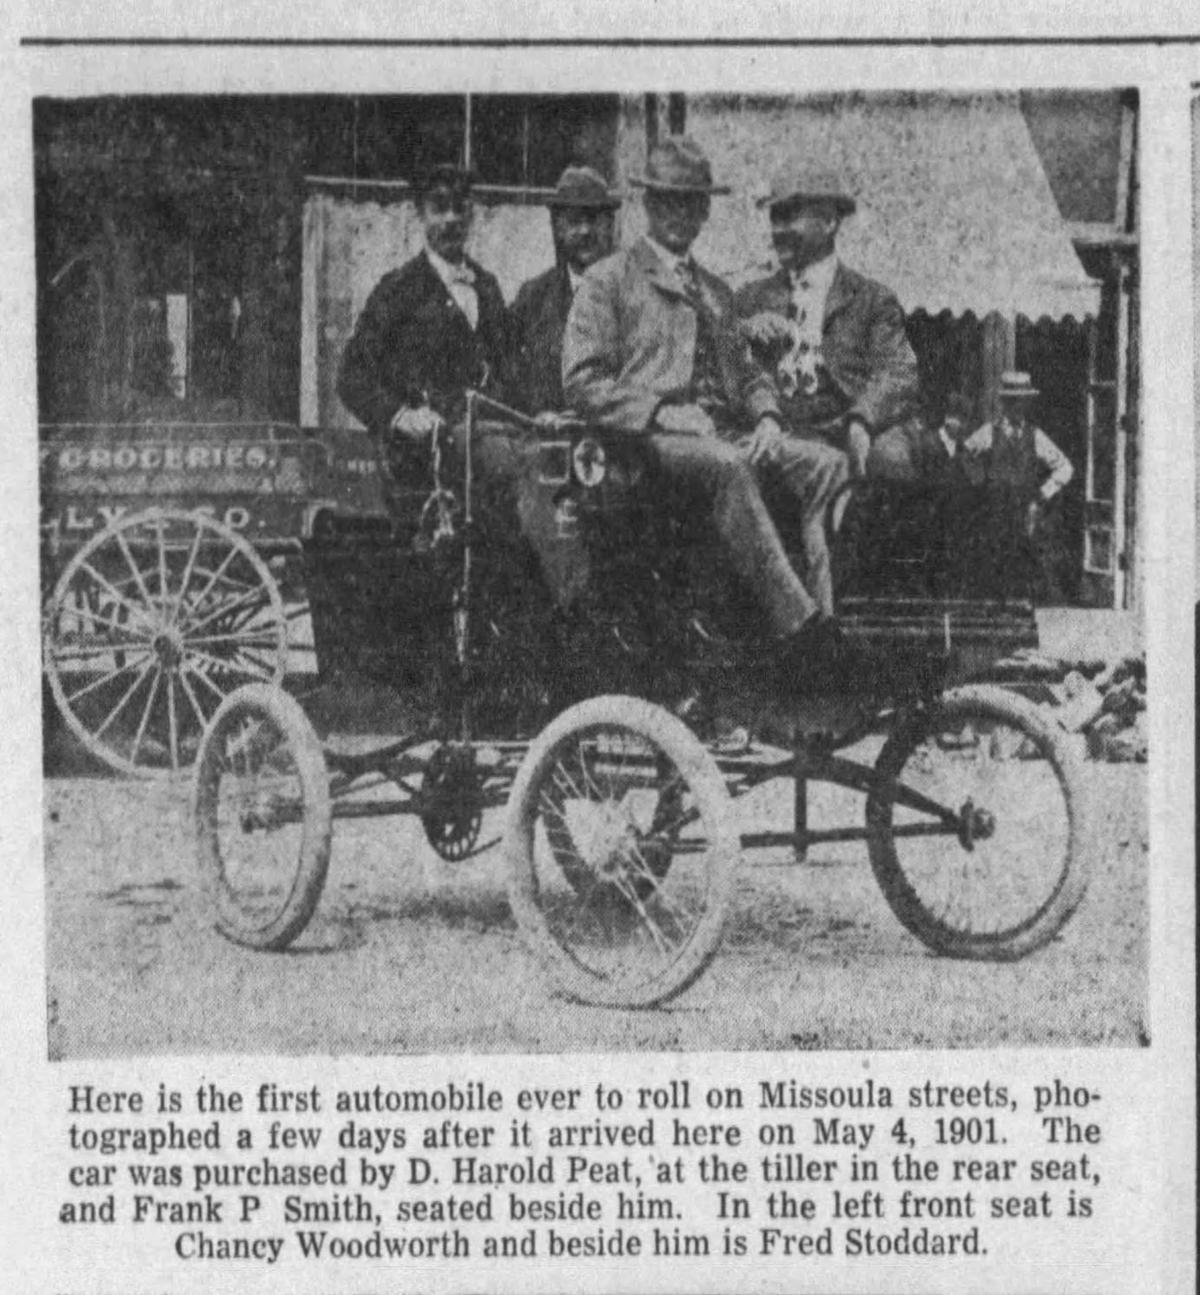 Missoula's first automobile